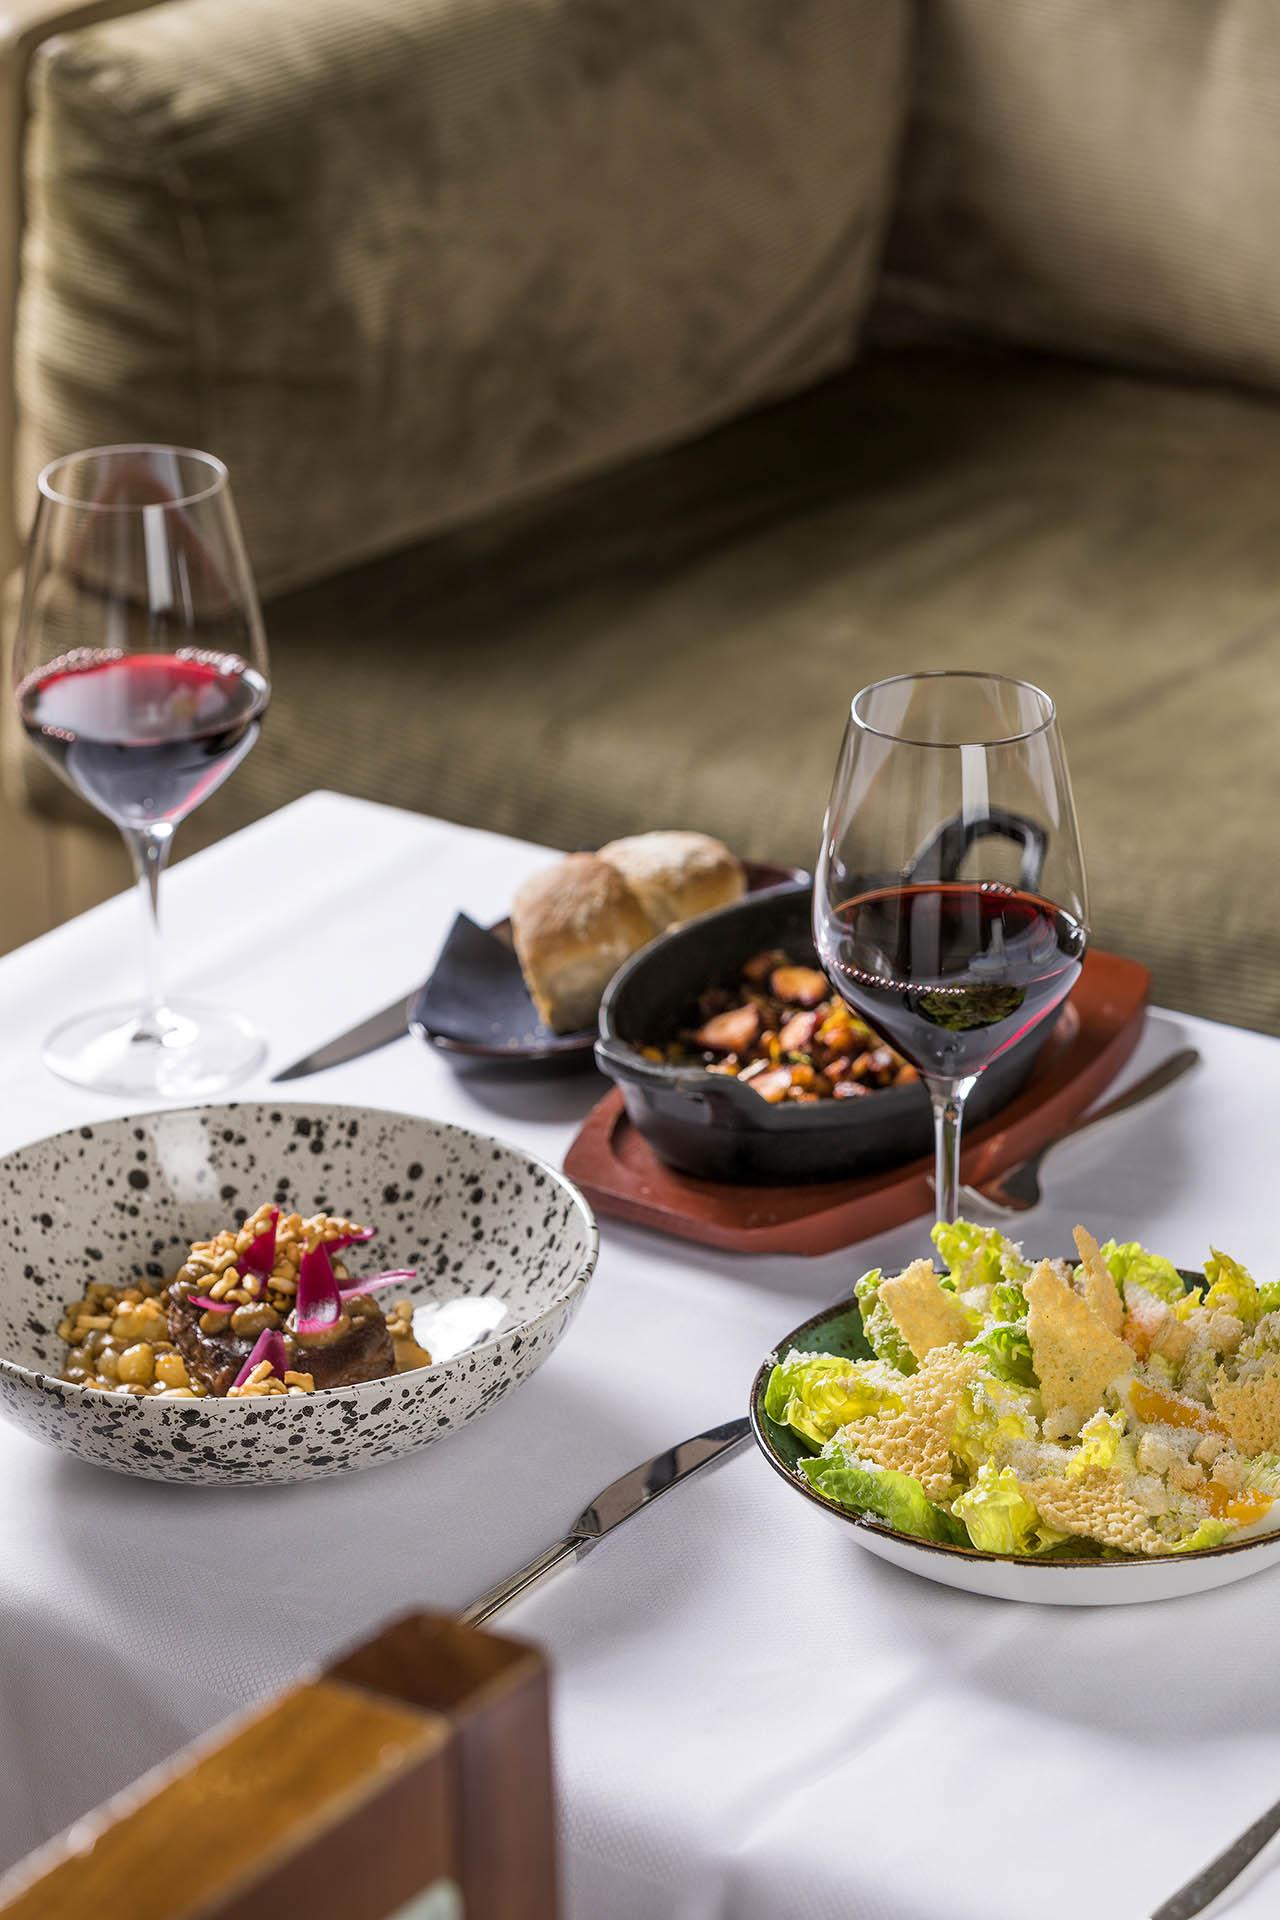 Hotel Okura Amsterdam - Okura at Home - Serre's dishes - Table setting